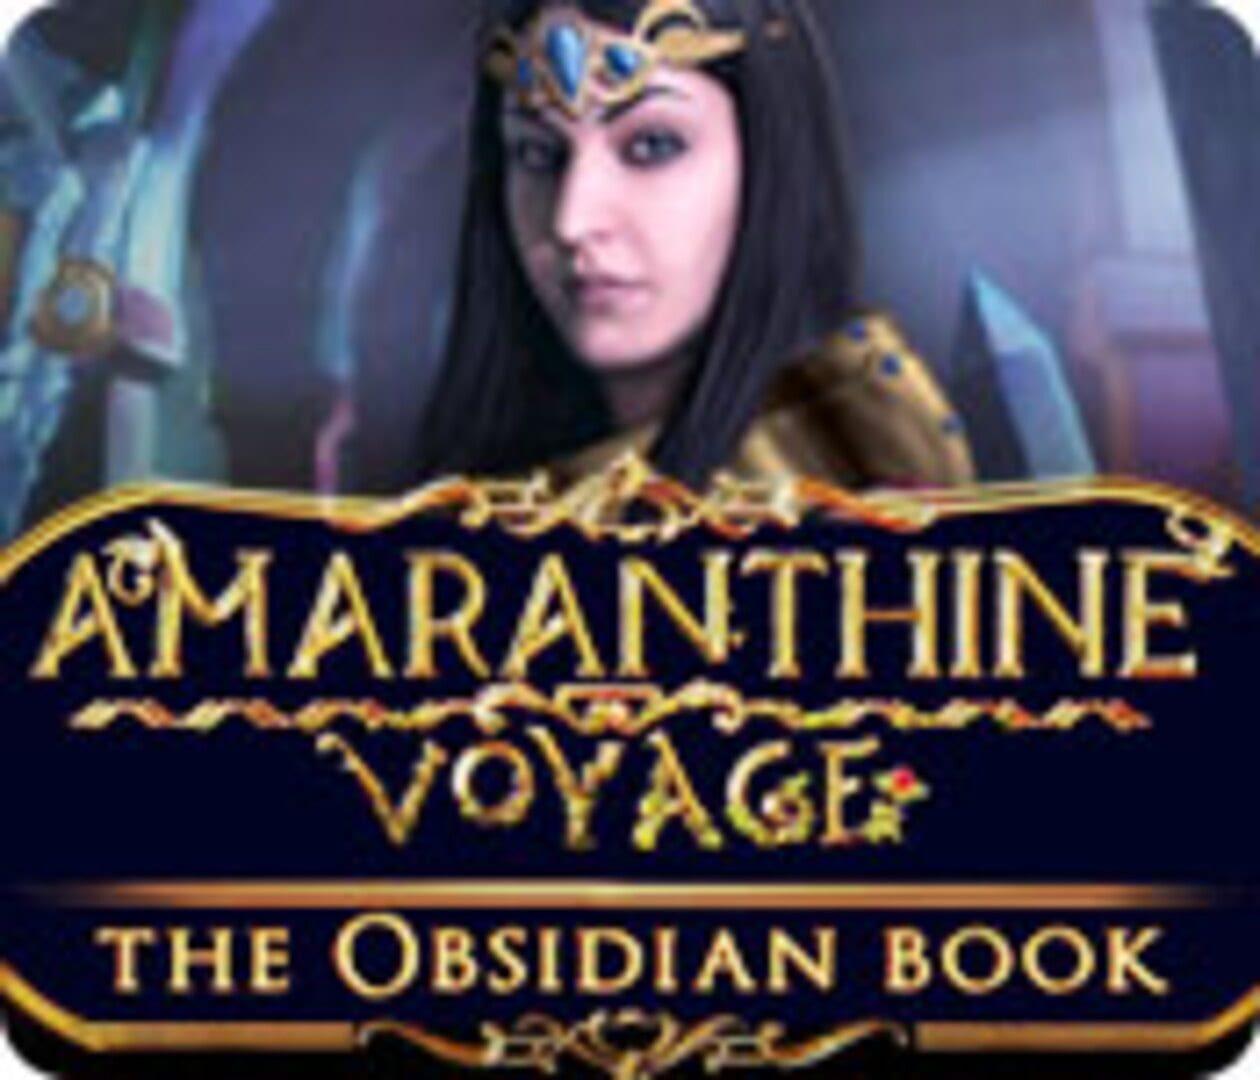 buy Amaranthine Voyage: The Obsidian Book cd key for all platform